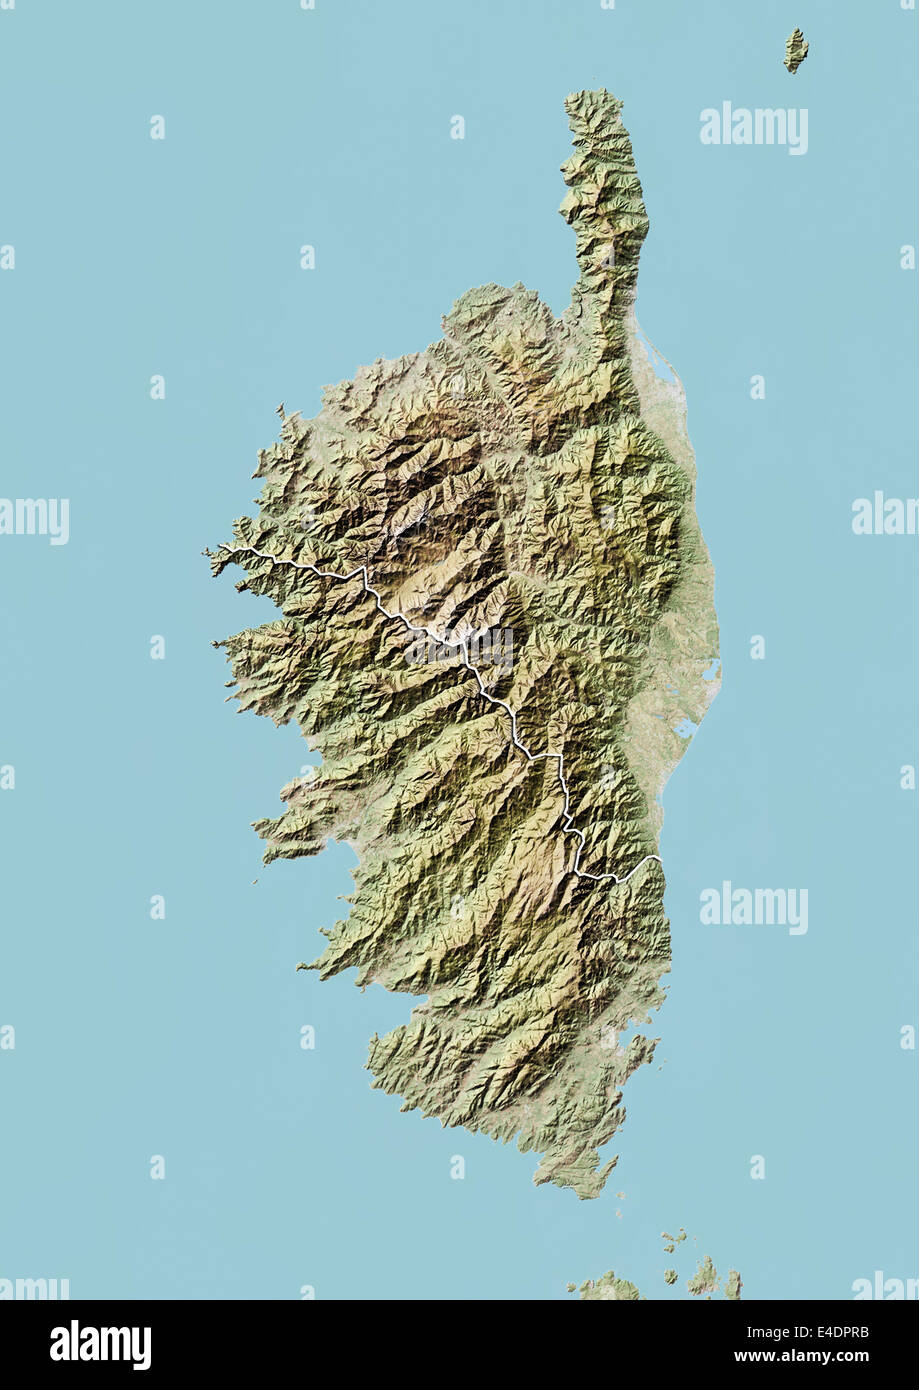 Map Corsica Stockfotos & Map Corsica Bilder - Seite 2 - Alamy